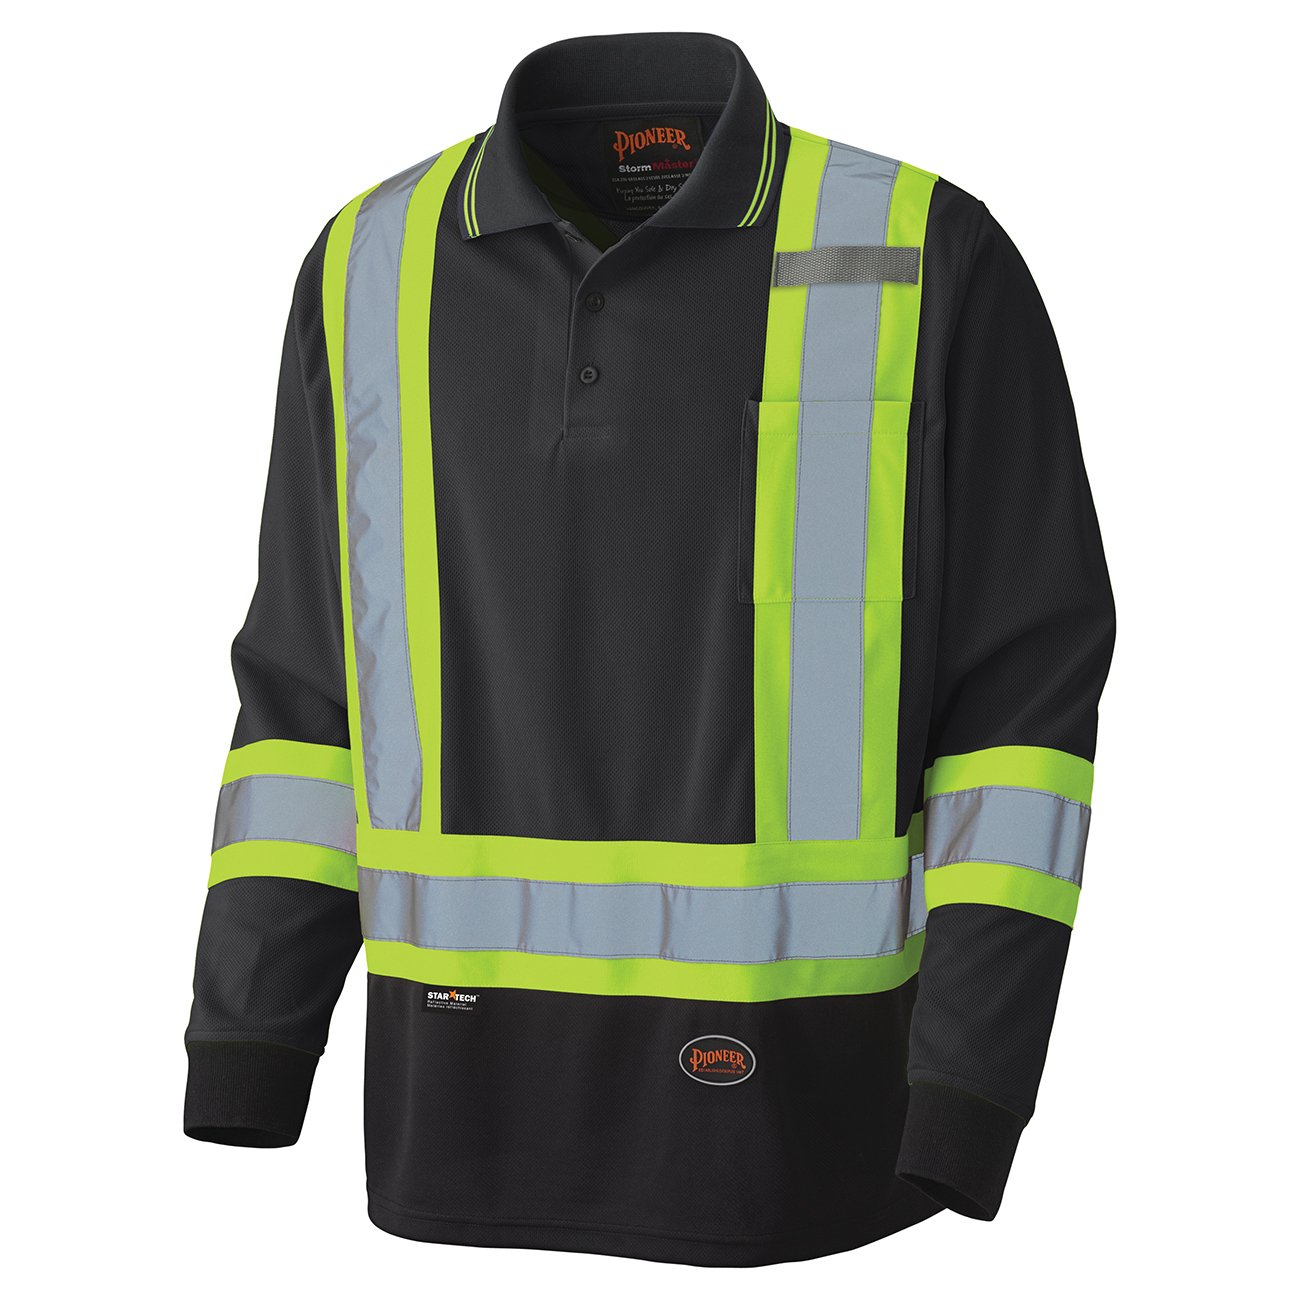 Pioneer Birdseye Long-Sleeved Safety Polo Shirt V1051470